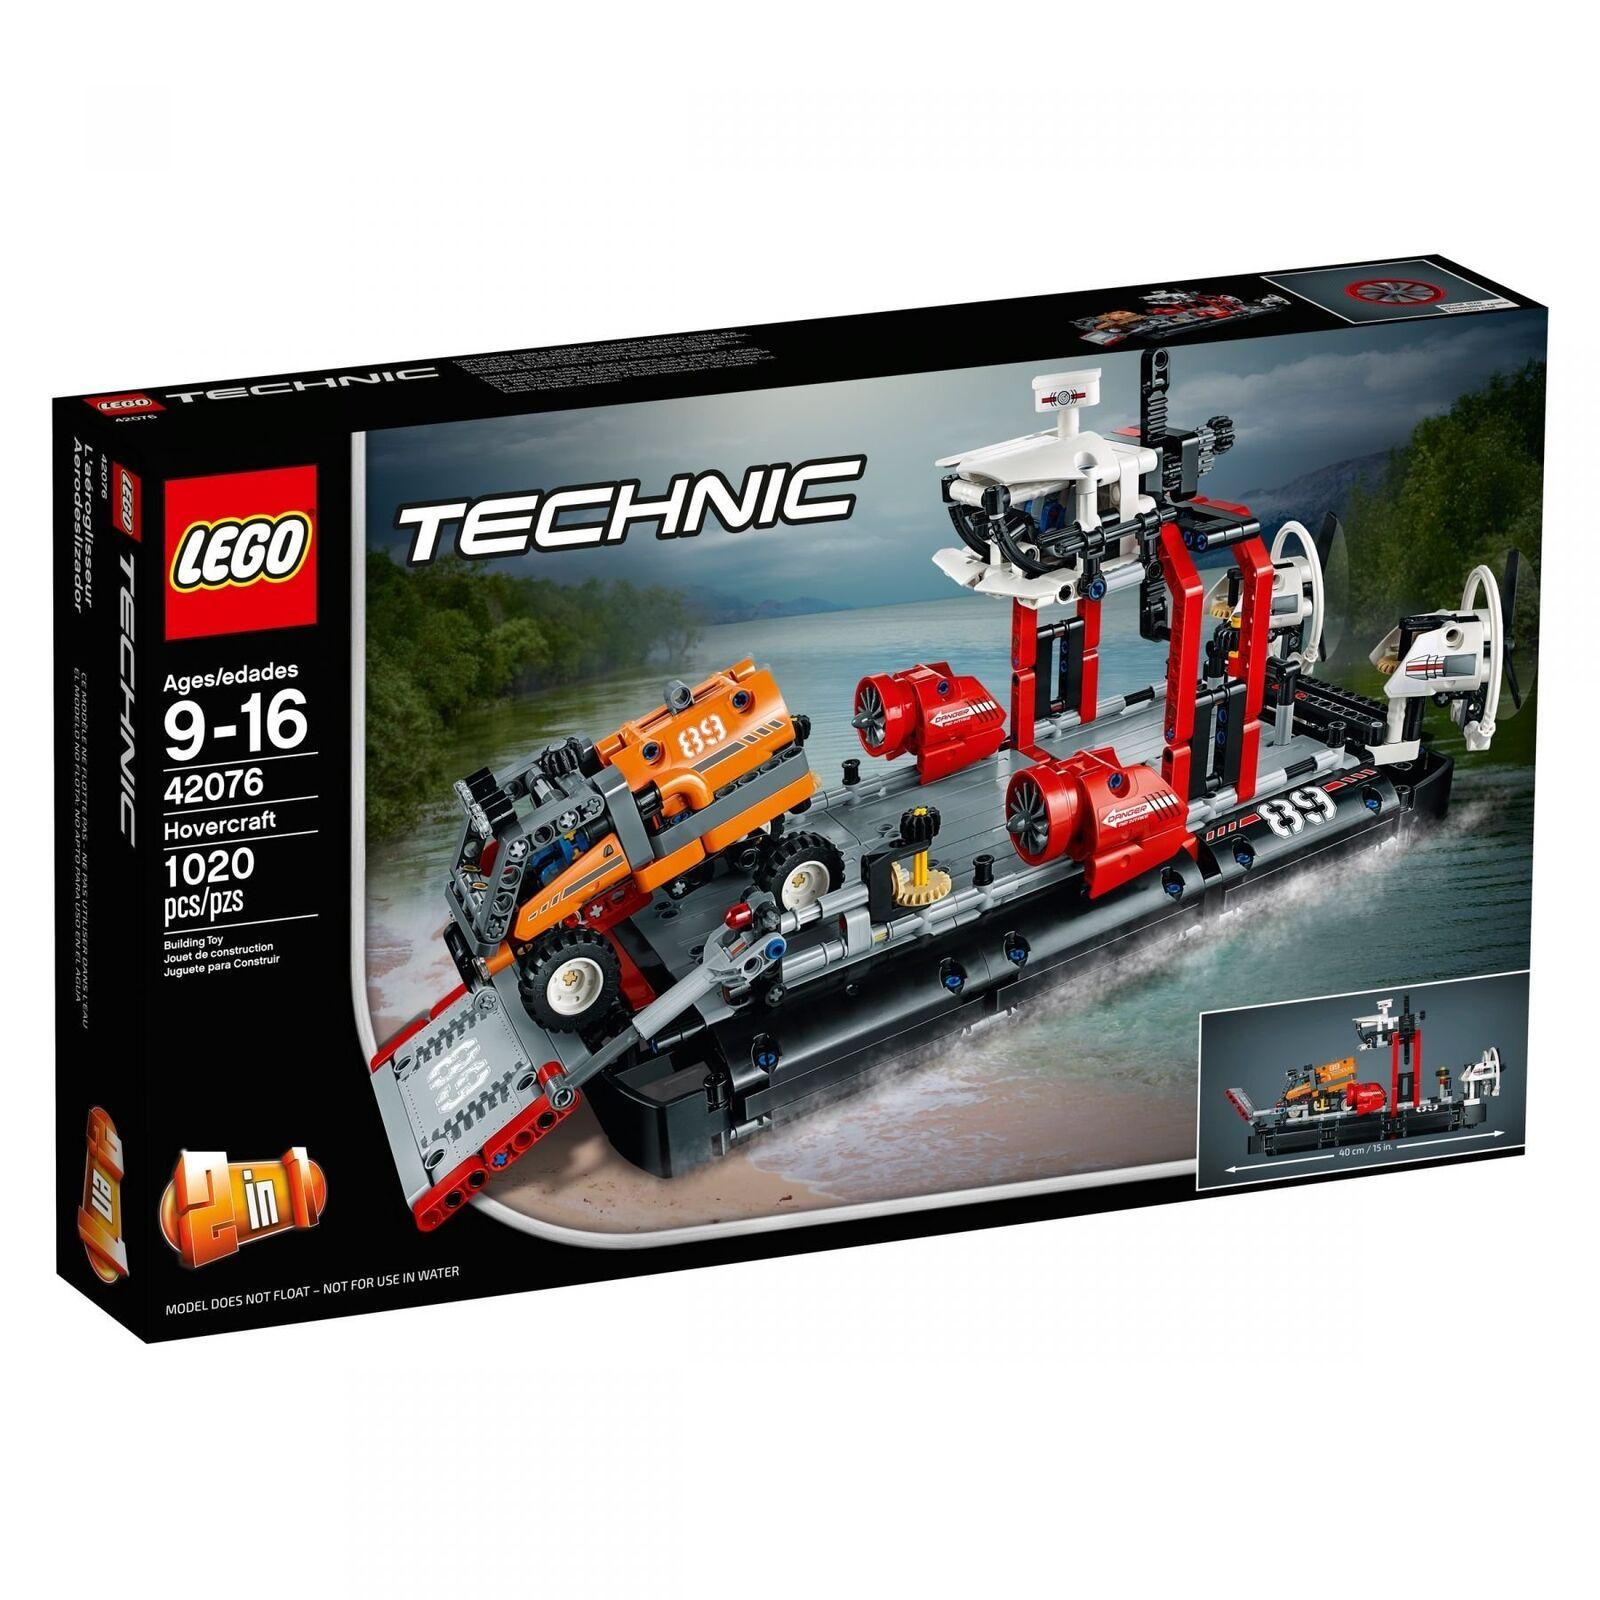 Lego Technic™ 42076 Hydroglisseur Neuf Emballage D'Origine Misb